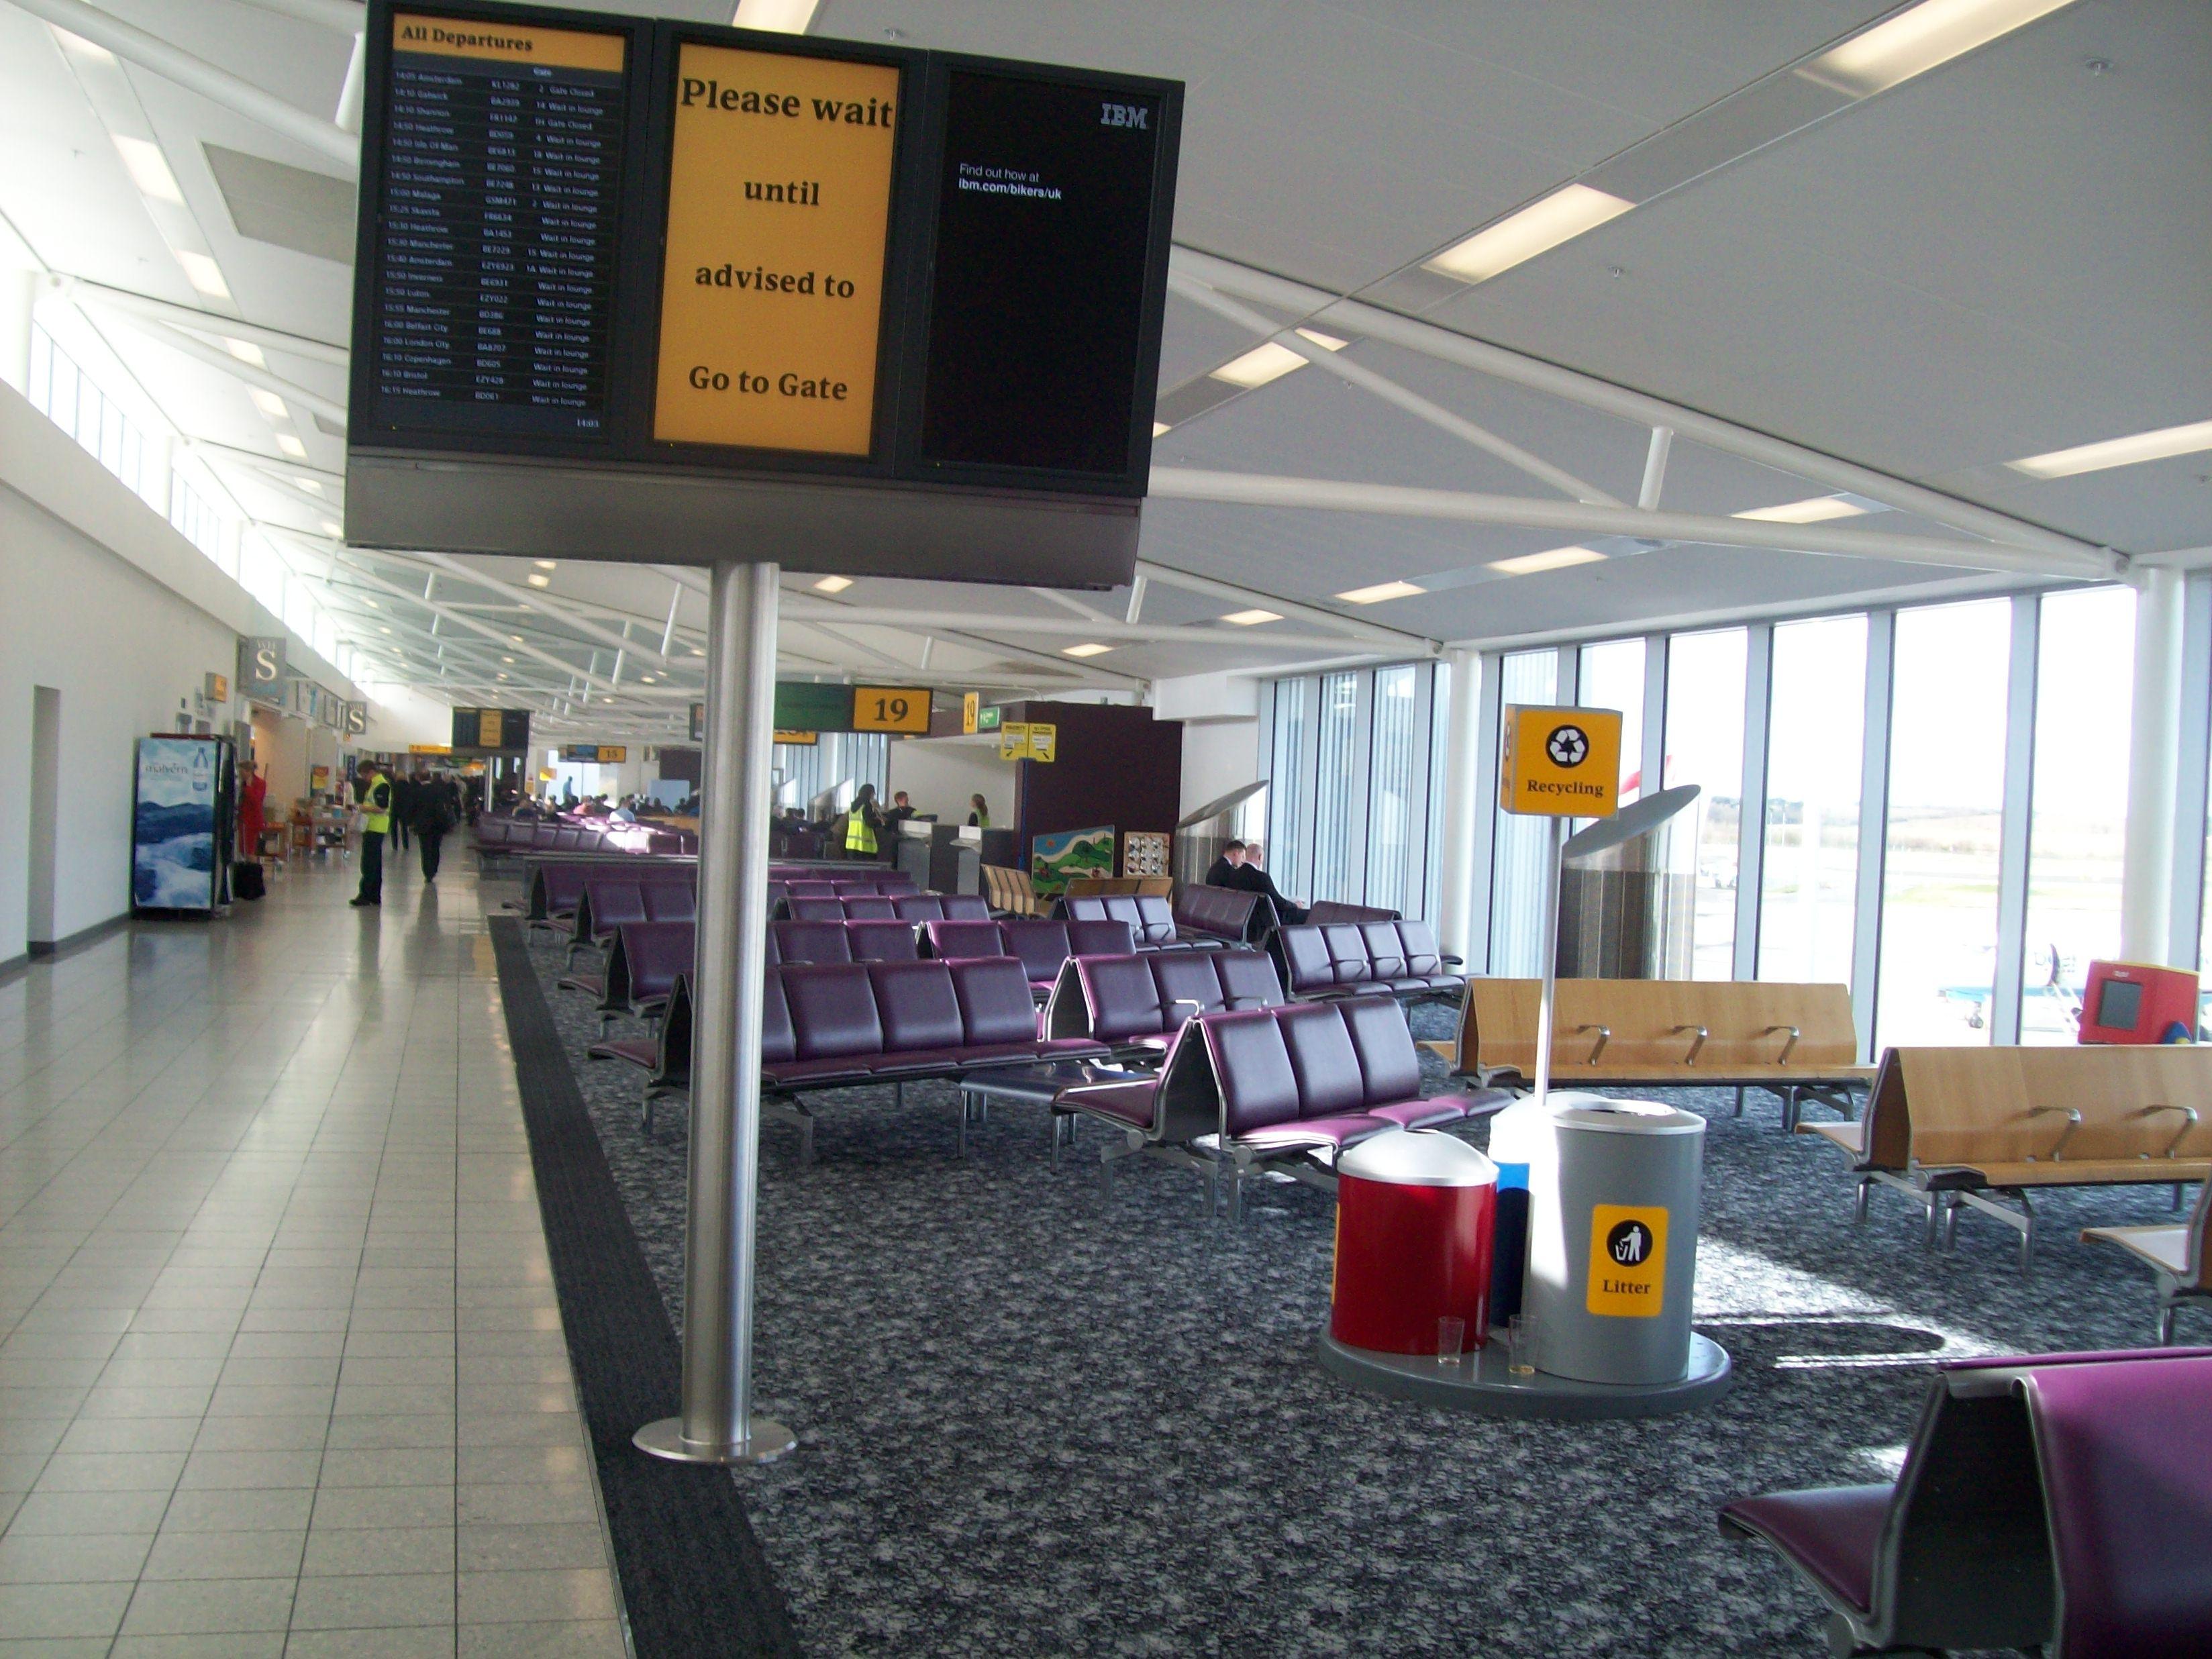 FileEdinburgh Airport gate lounge.jpg Wikimedia Commons